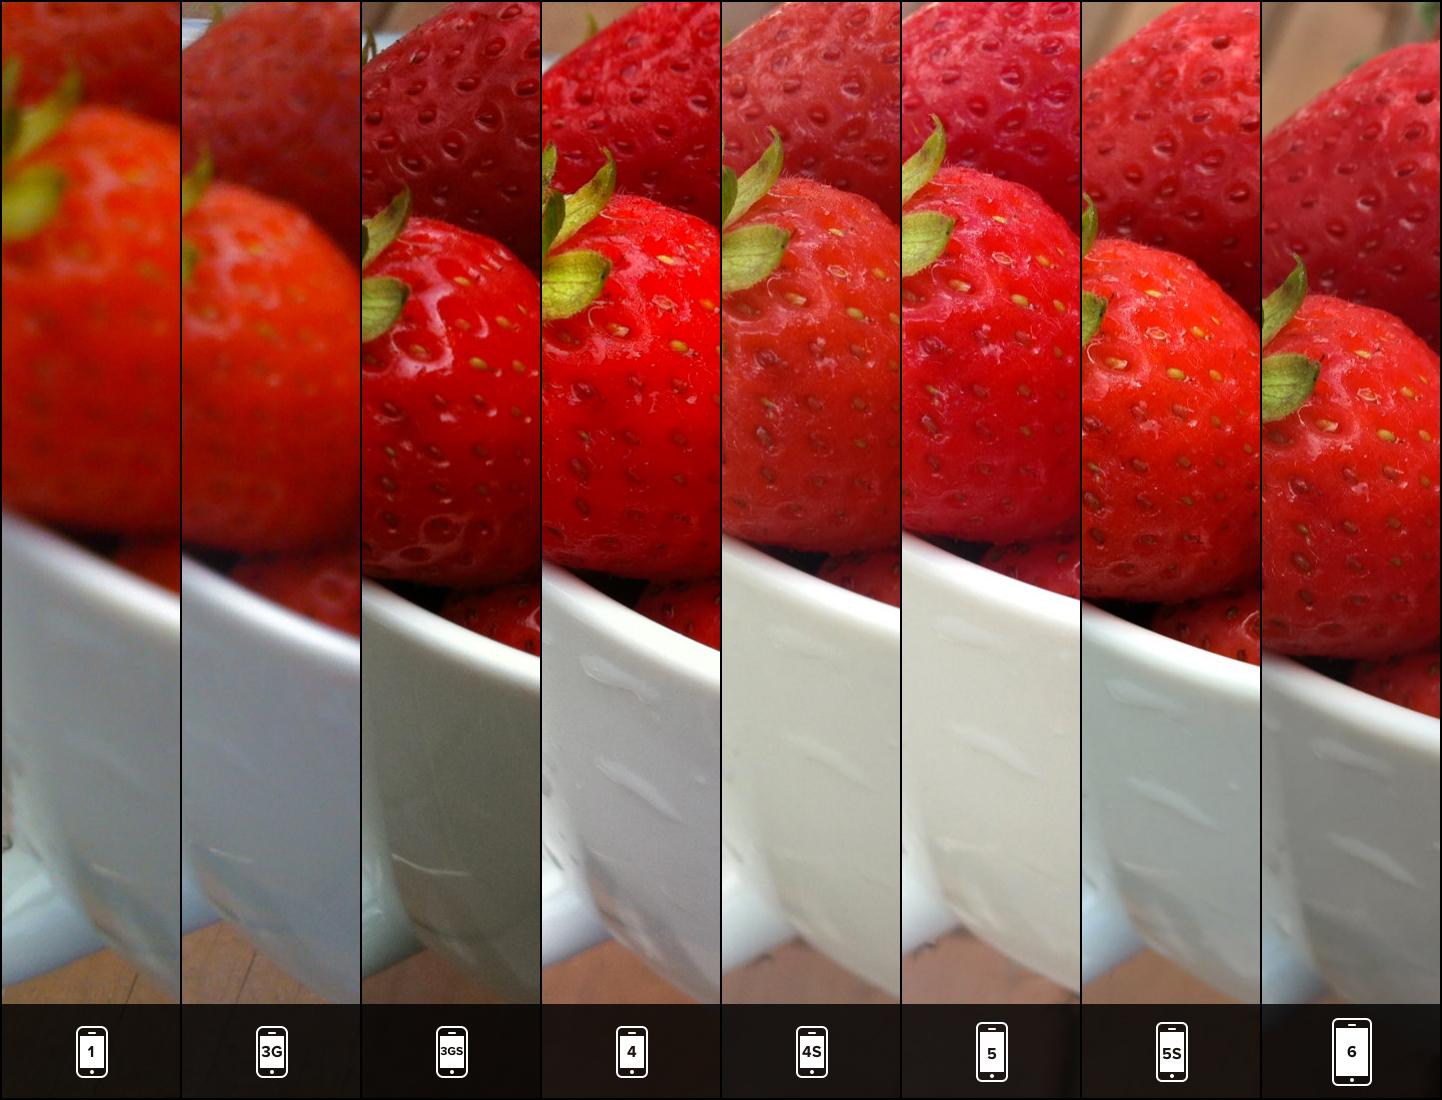 Teste do iPhone 6 pela tap tap tap